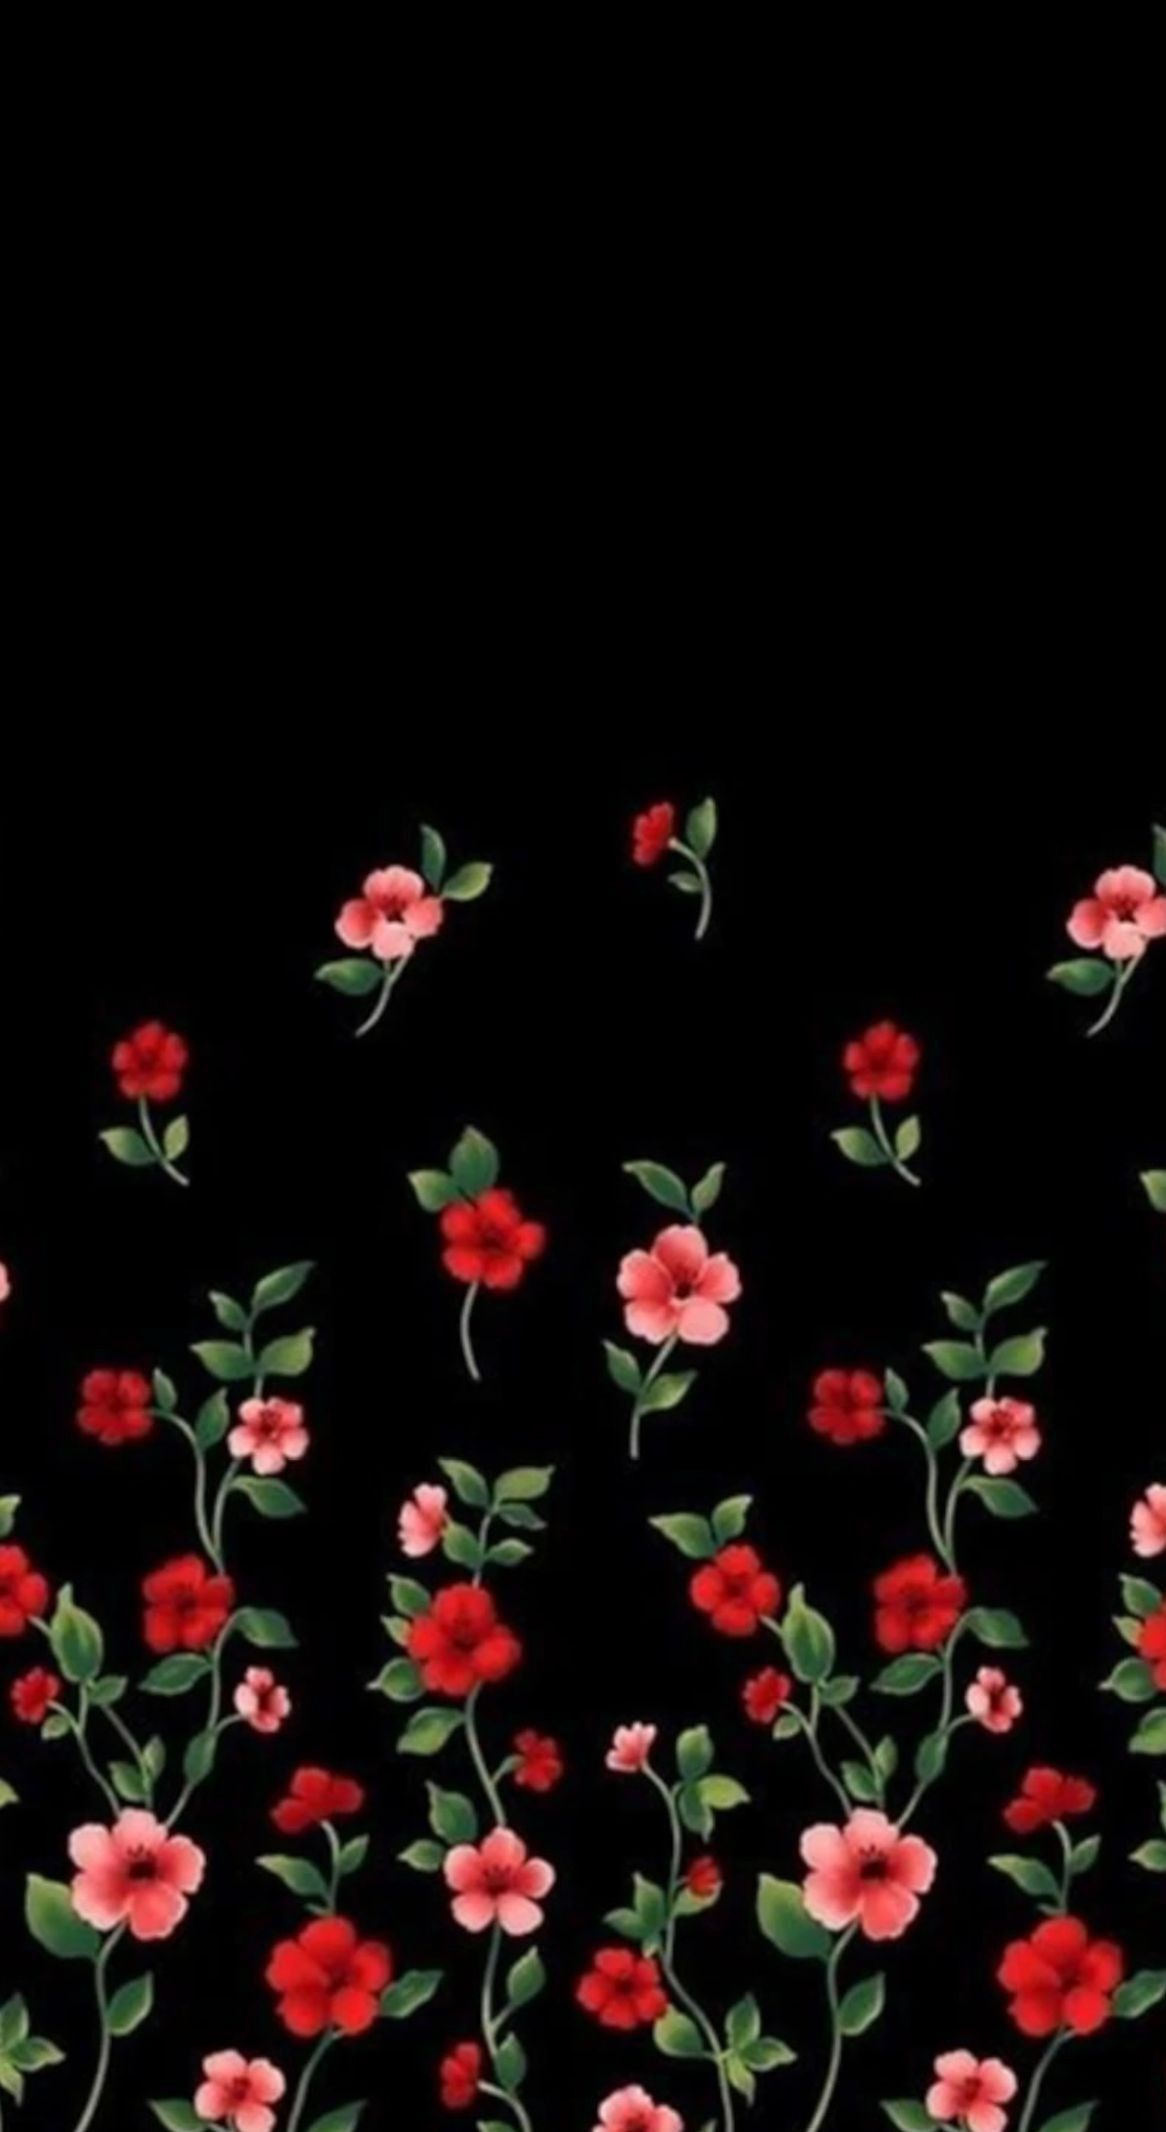 Image Result For Red And Black Flower Black Flowers Wallpaper Flowery Wallpaper Floral Wallpaper Phone